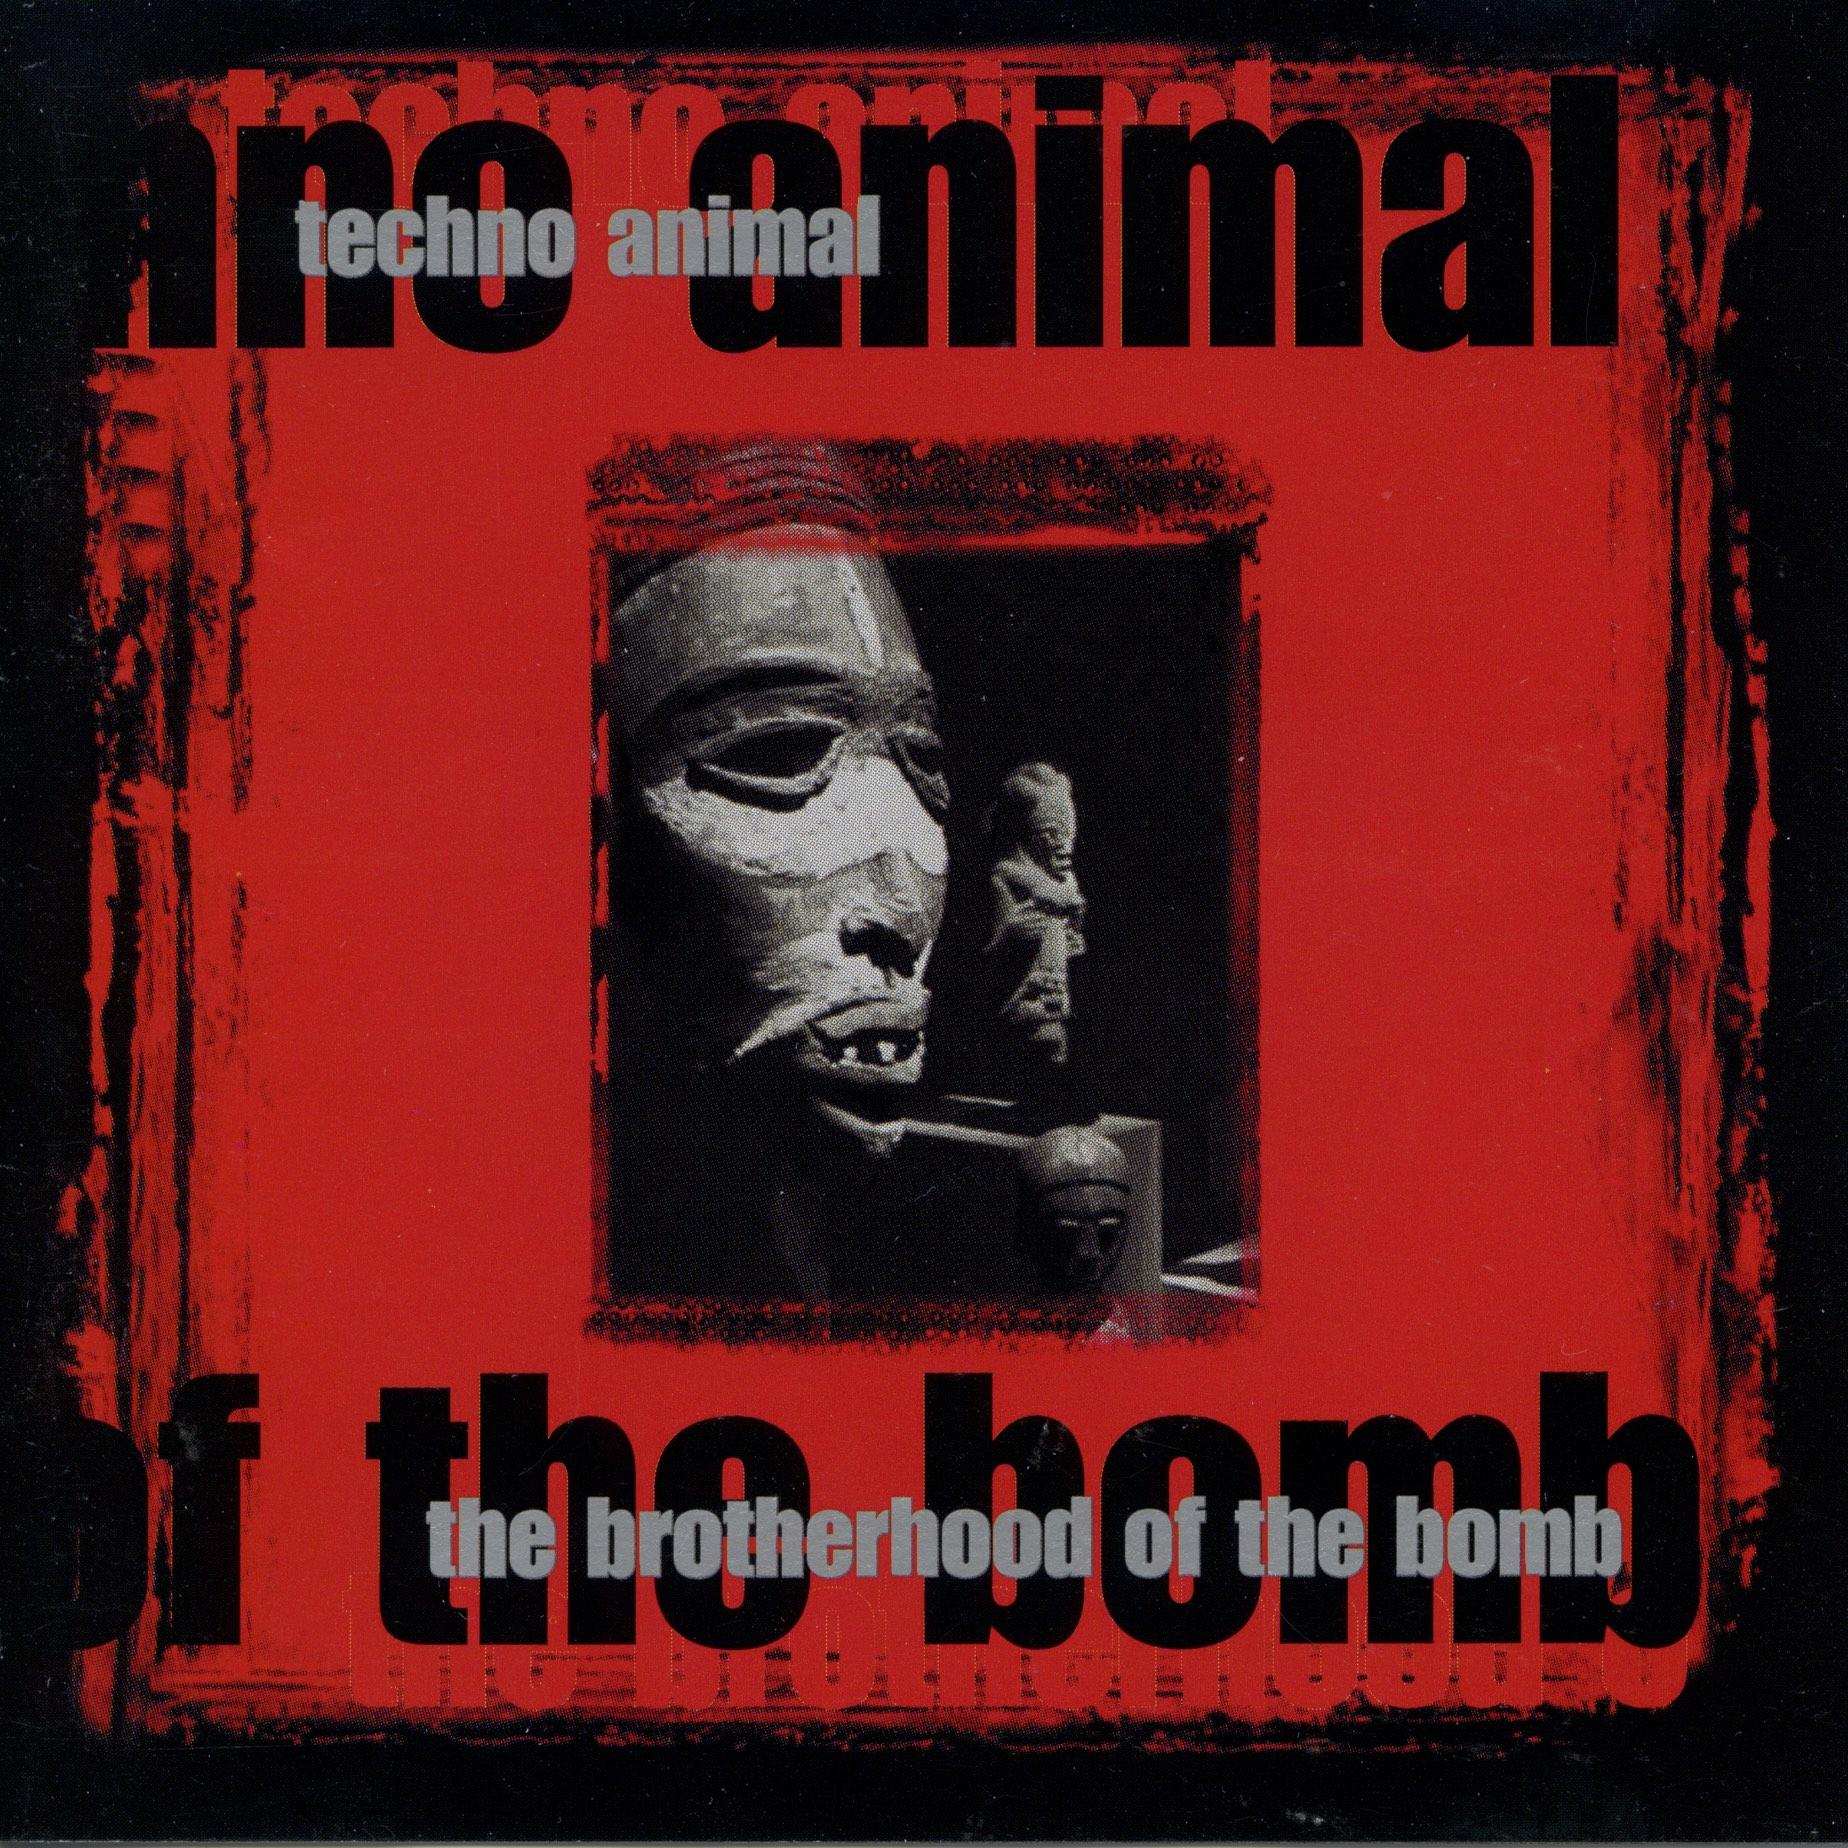 2001 - Techno Animal